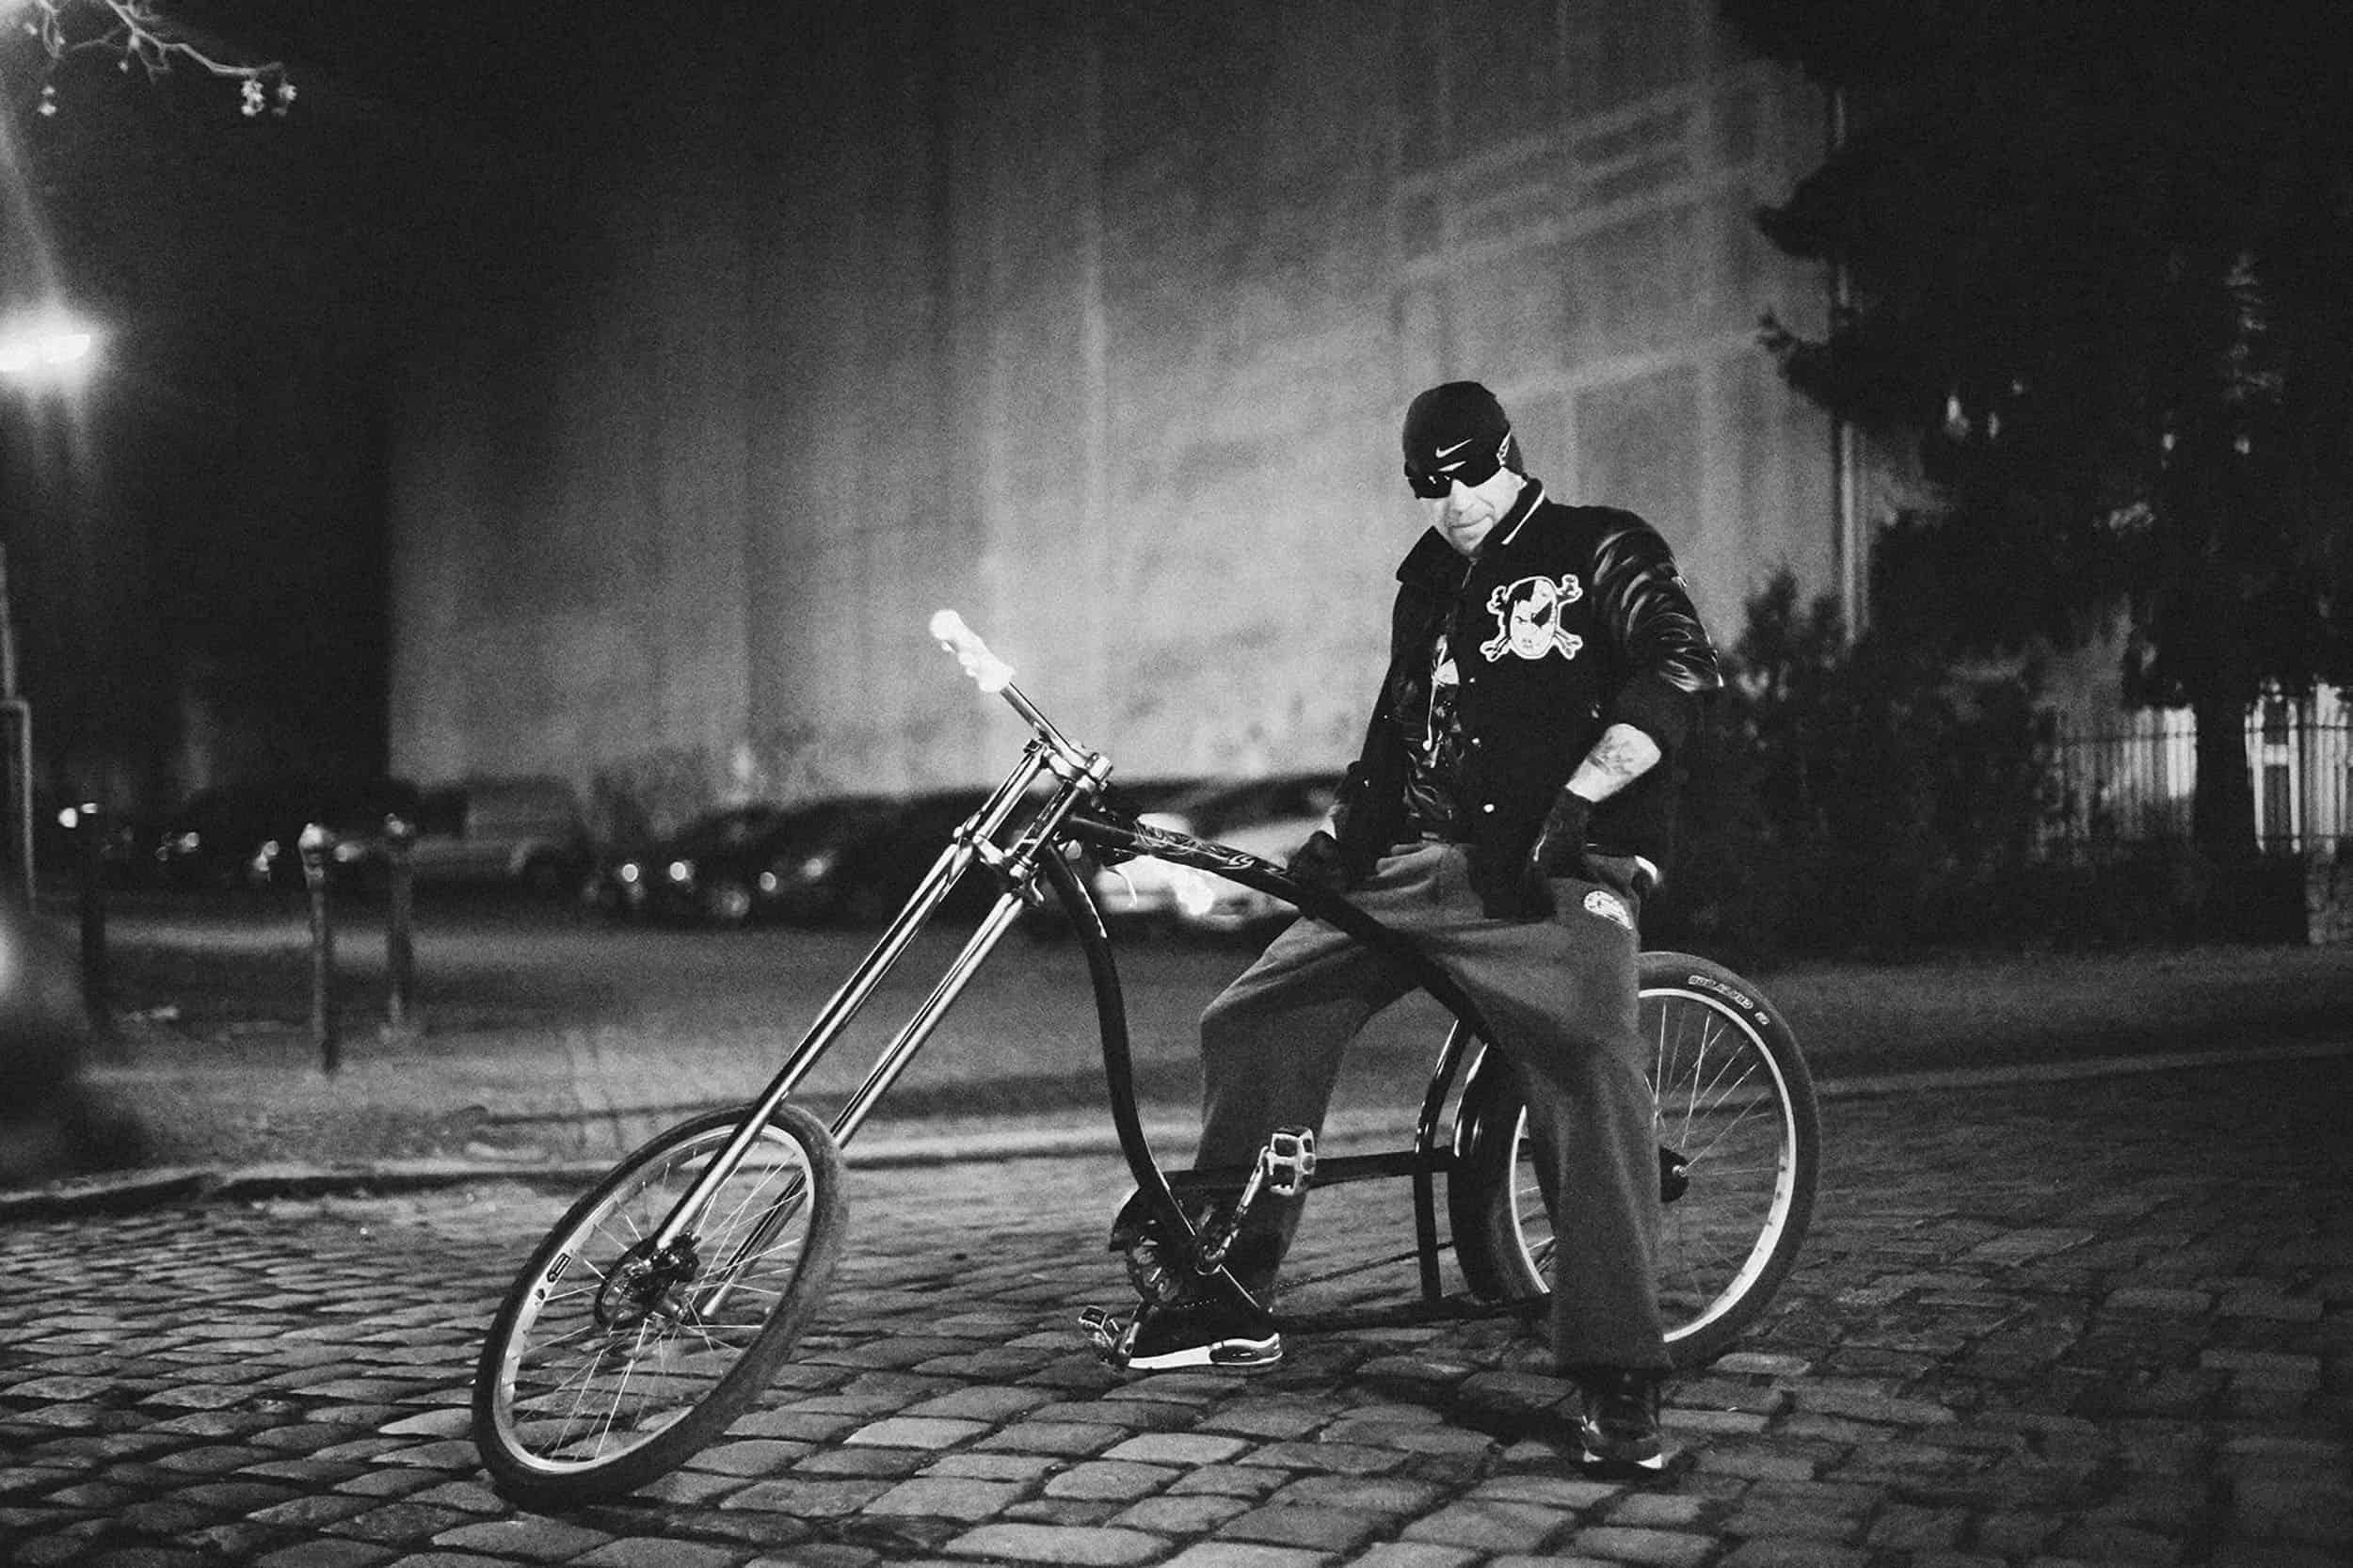 studio-ignatov-musicians-playboy51